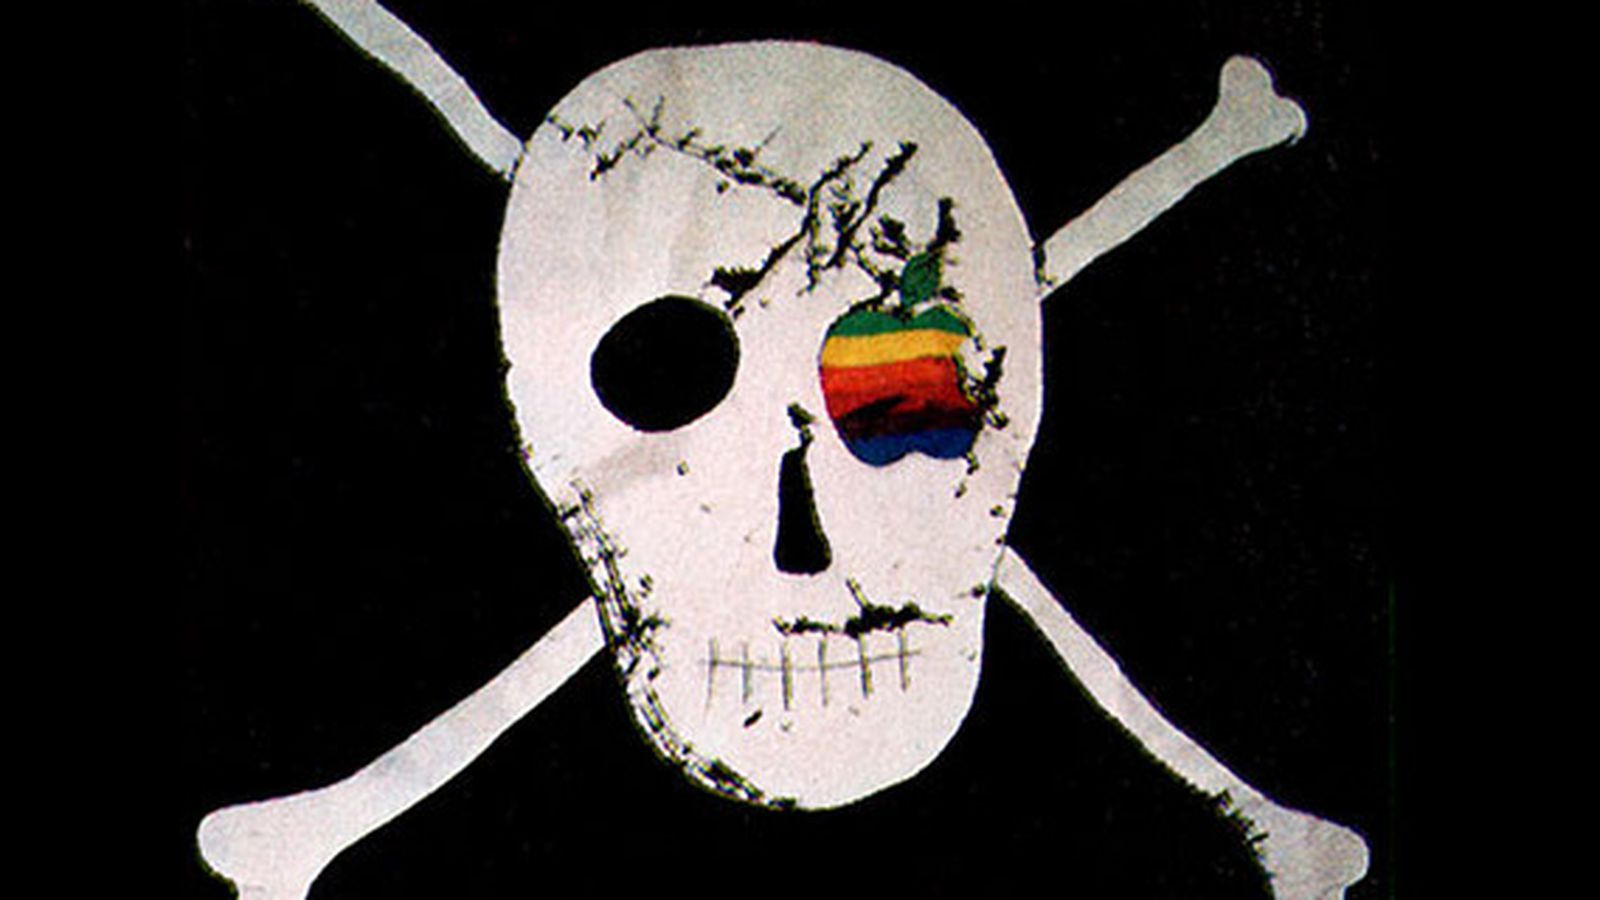 macintosh designer is selling $1,900 replicas of apple's legendary